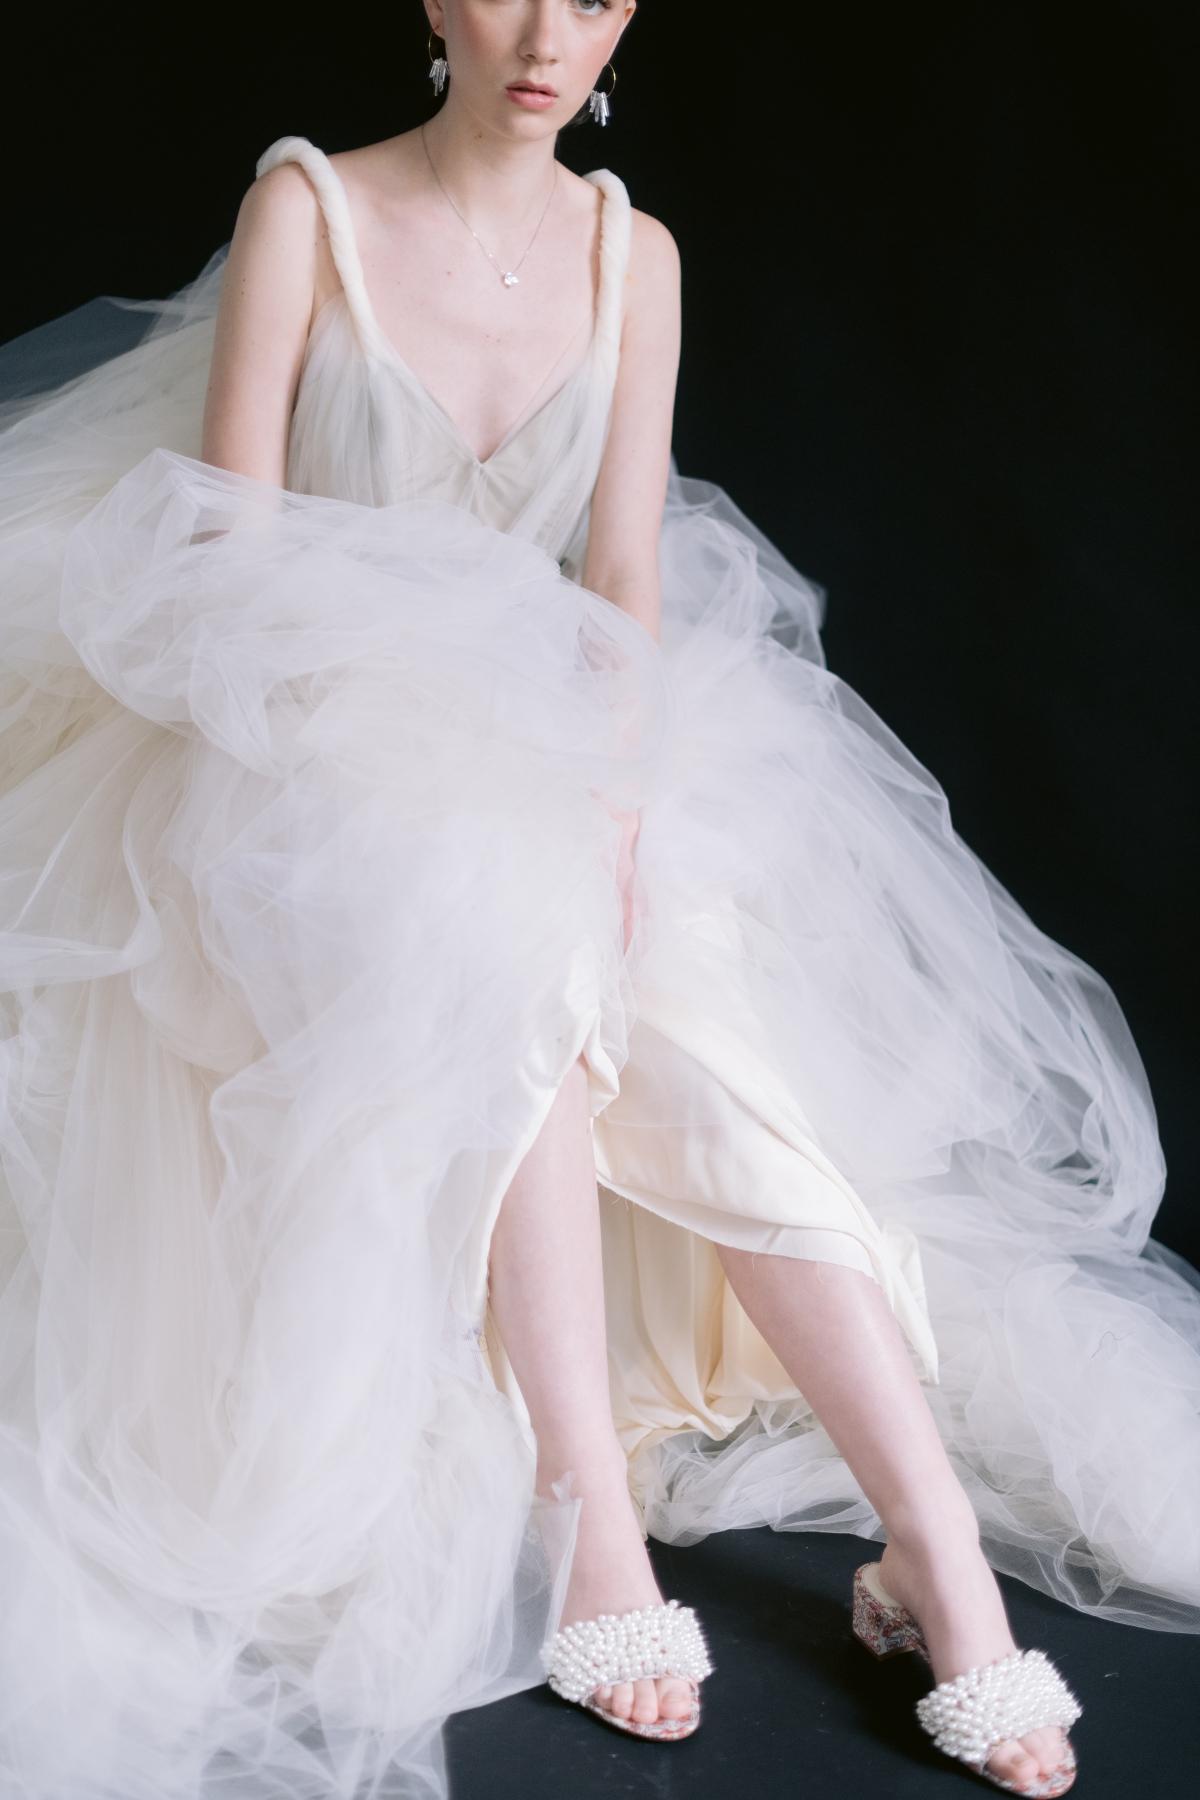 Laura Lanzerotte Bridal Danielle Heinson Photography 94